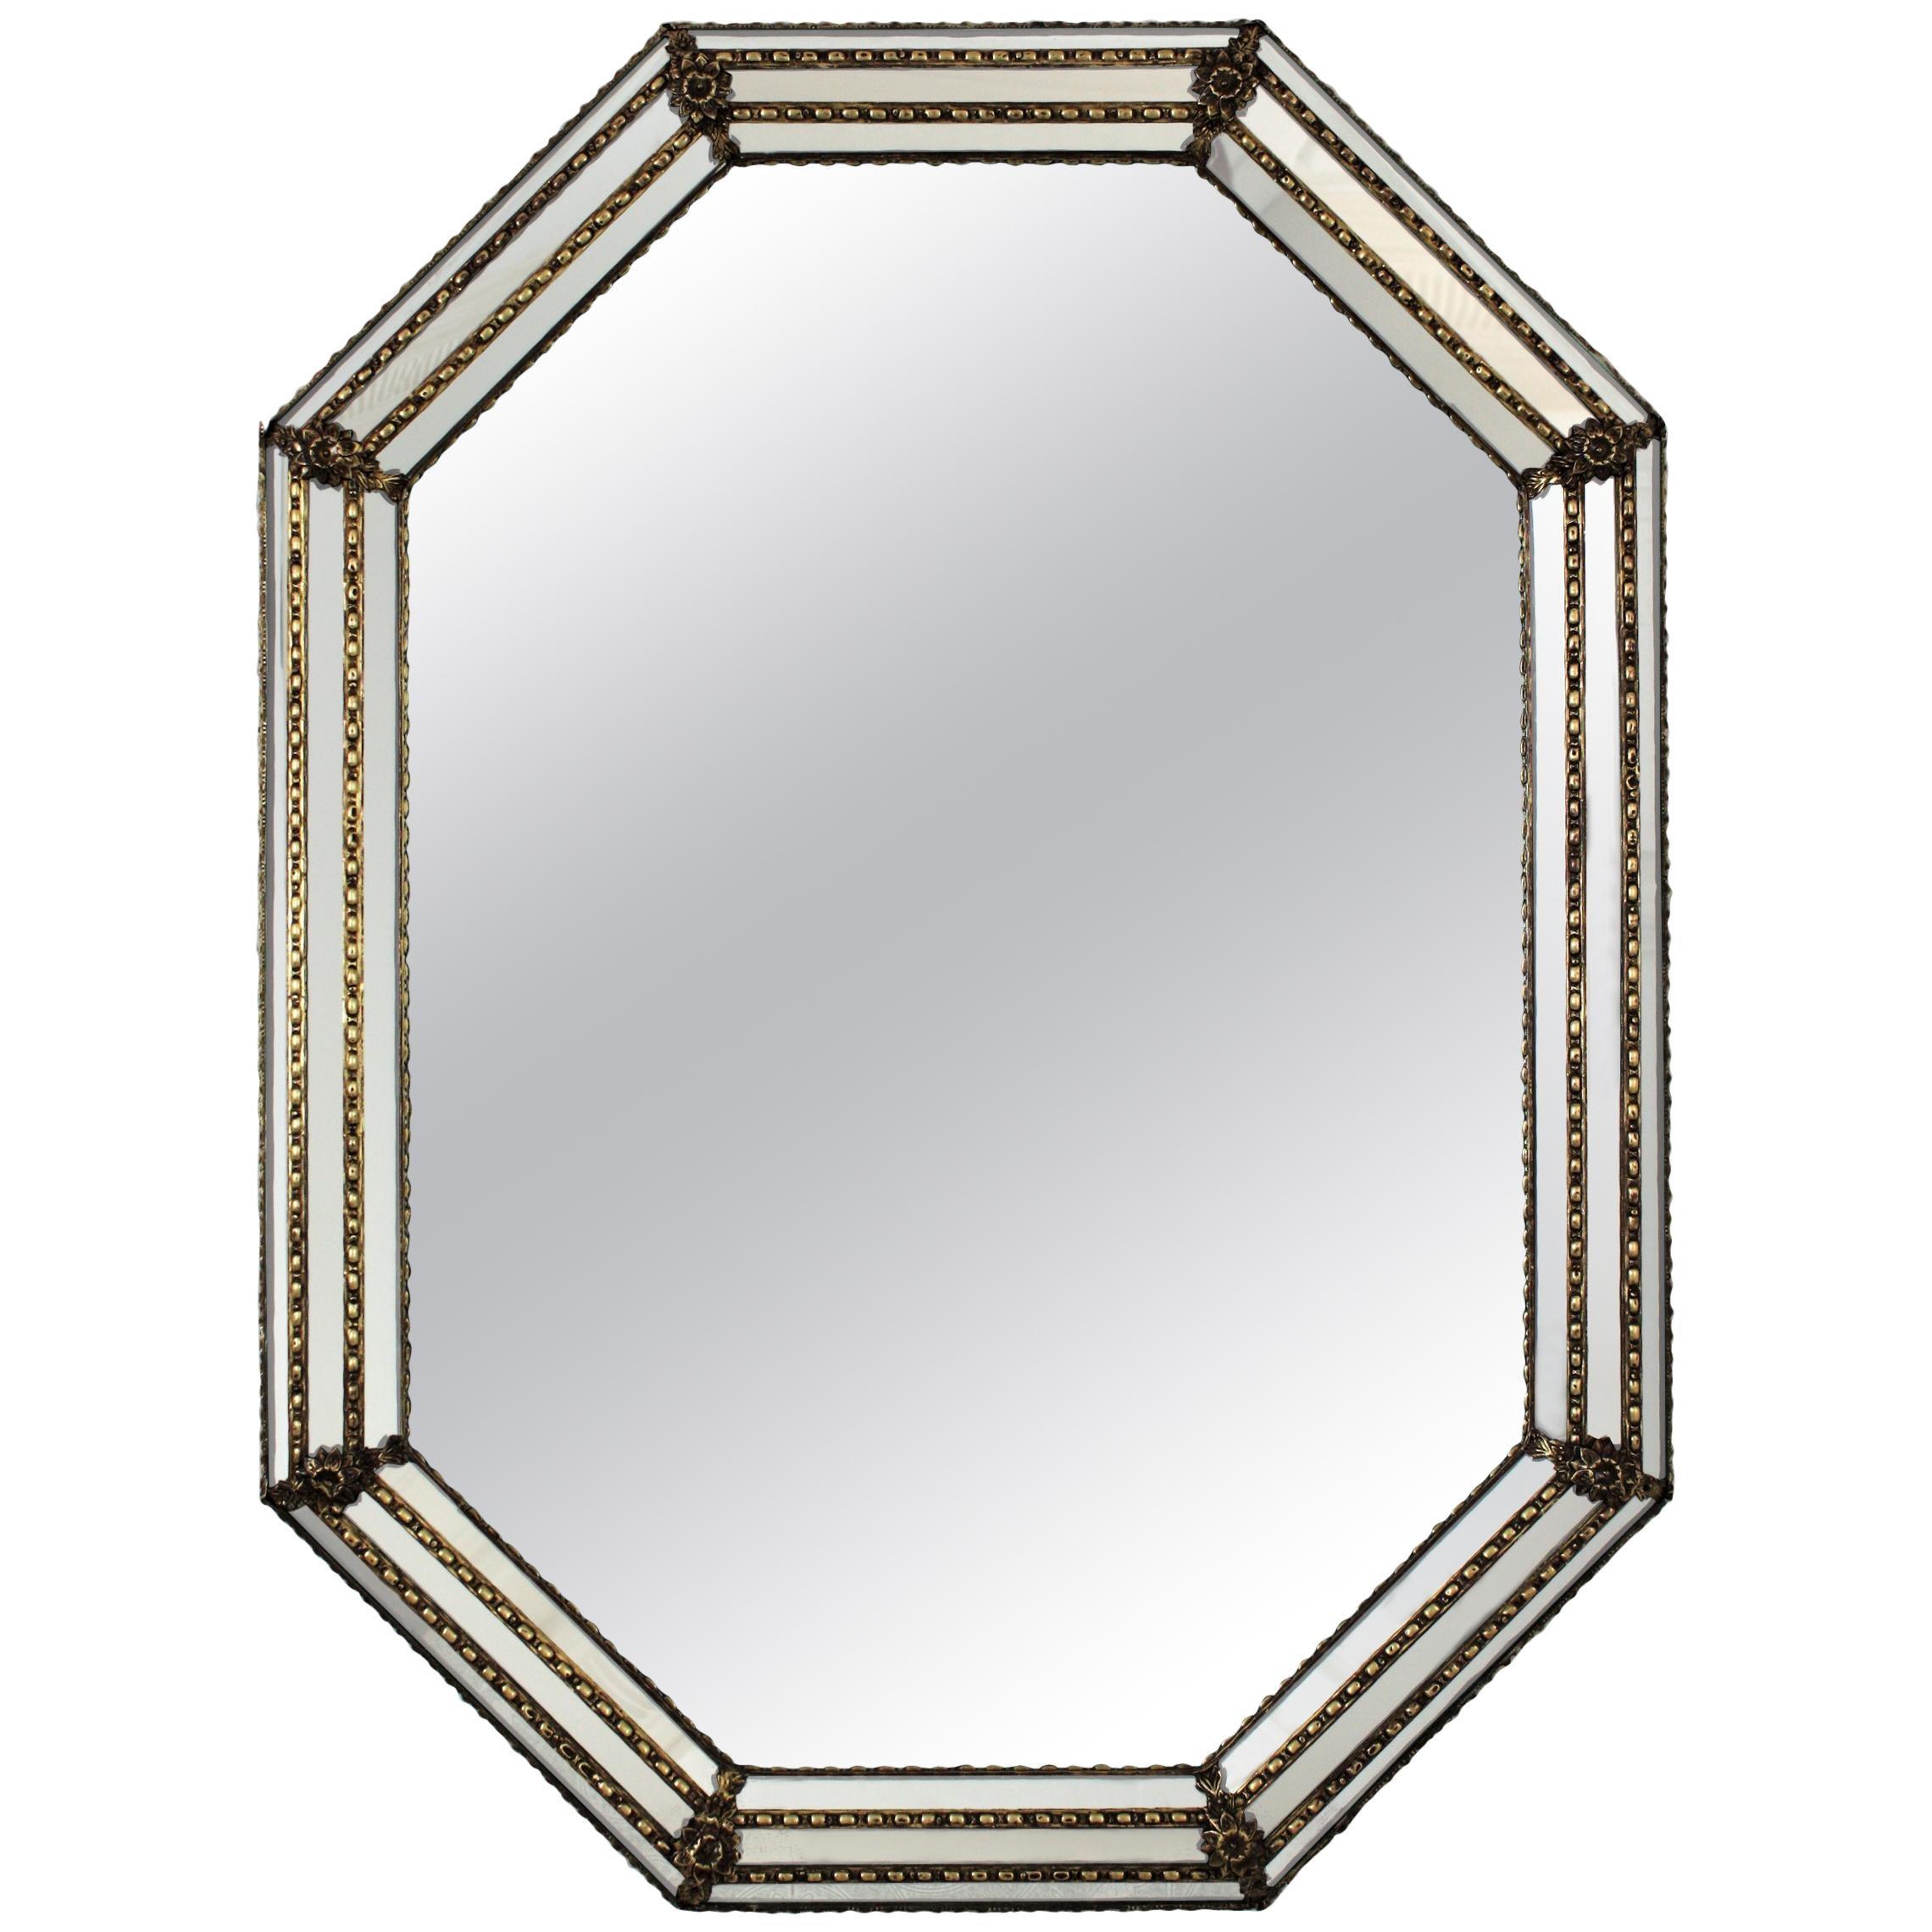 Octagonal Venetian Style Mirror with Brass Details